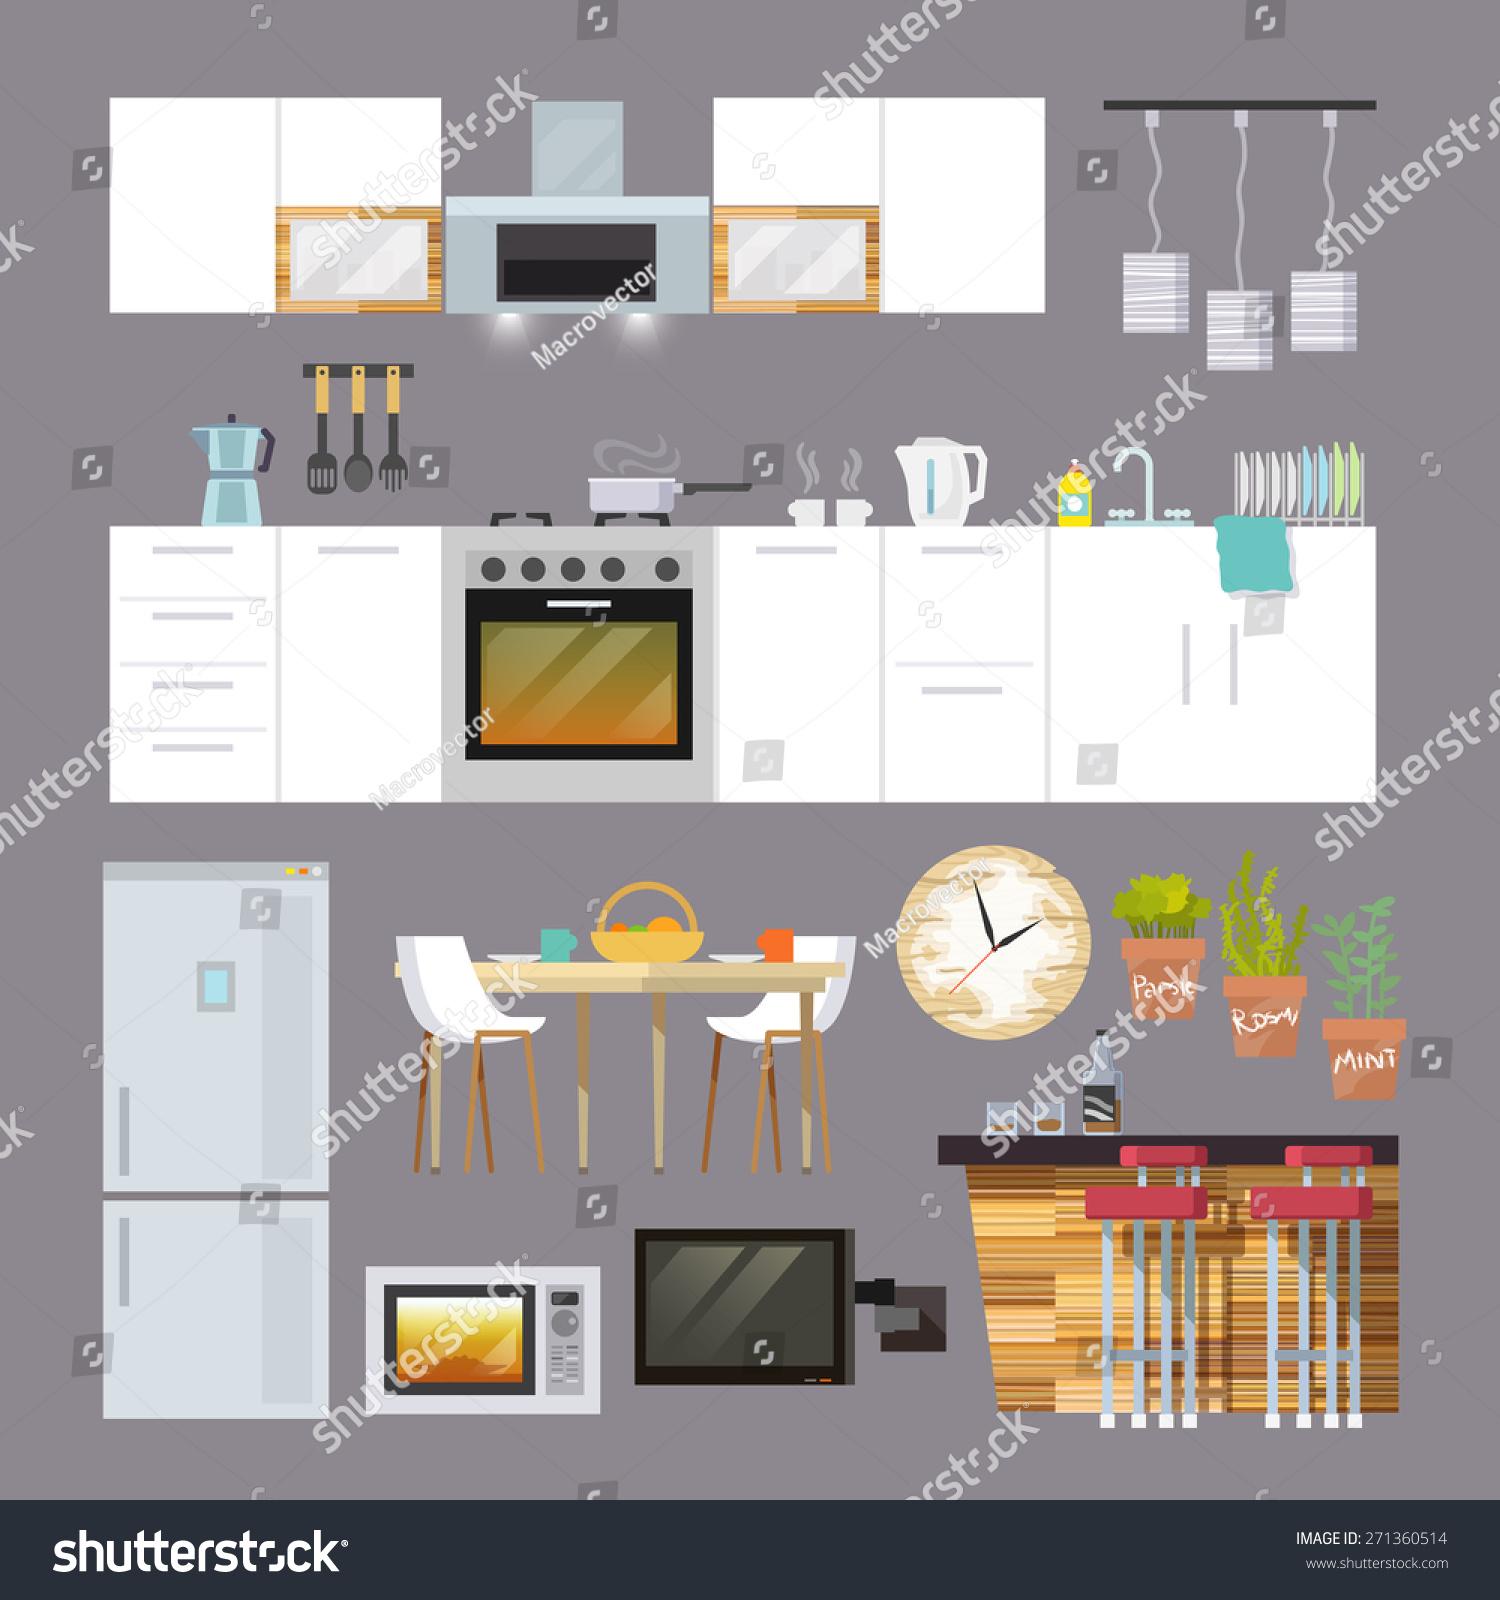 Kitchen Interior Furniture Decorative Icons Flat Stock Vector